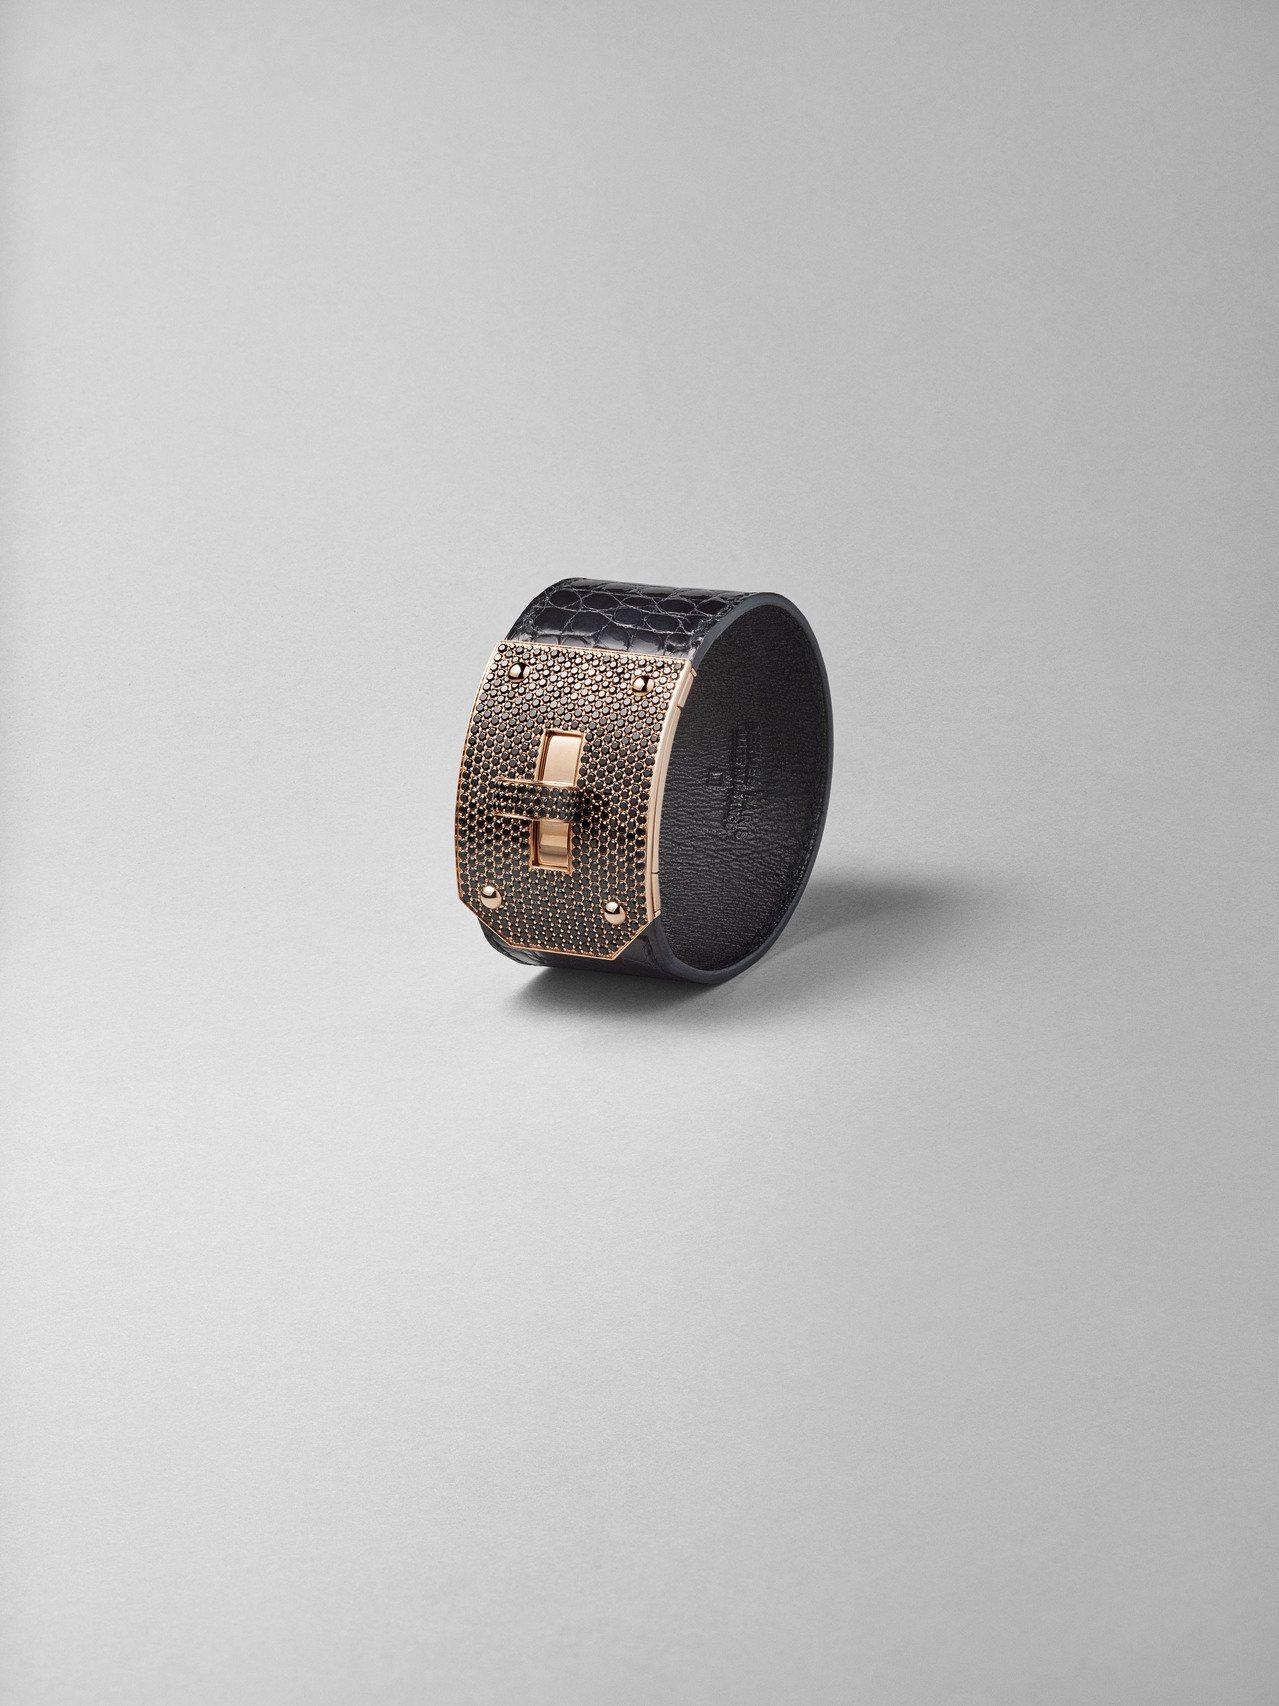 Kelly系列玫瑰金鑲黑尖晶石鱷魚皮手環,163萬4,100元。圖/愛馬仕提供